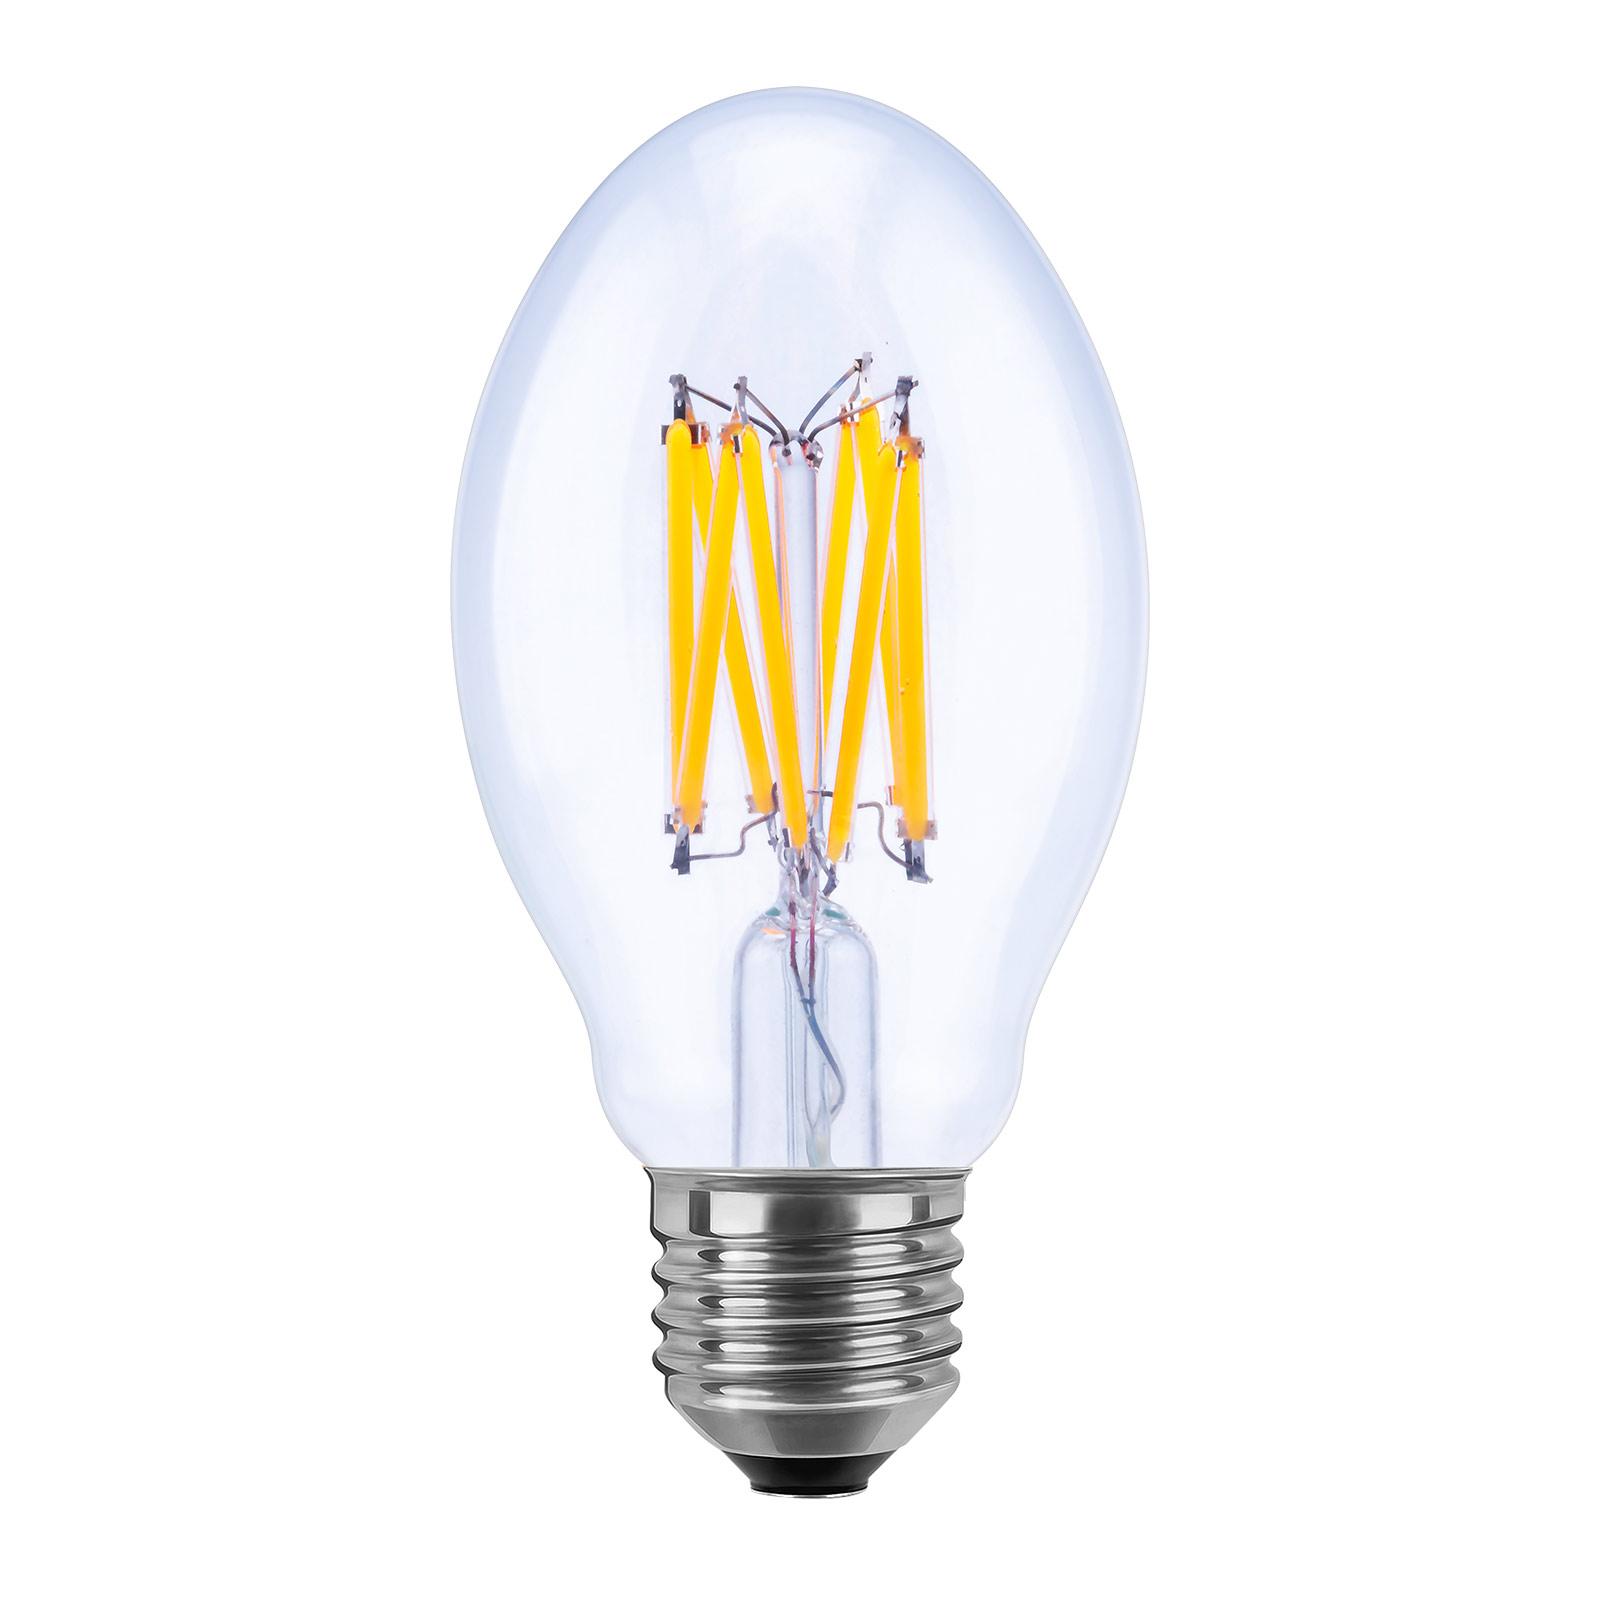 SEGULA LED-Mini Ellipse High Power E27 8W filament